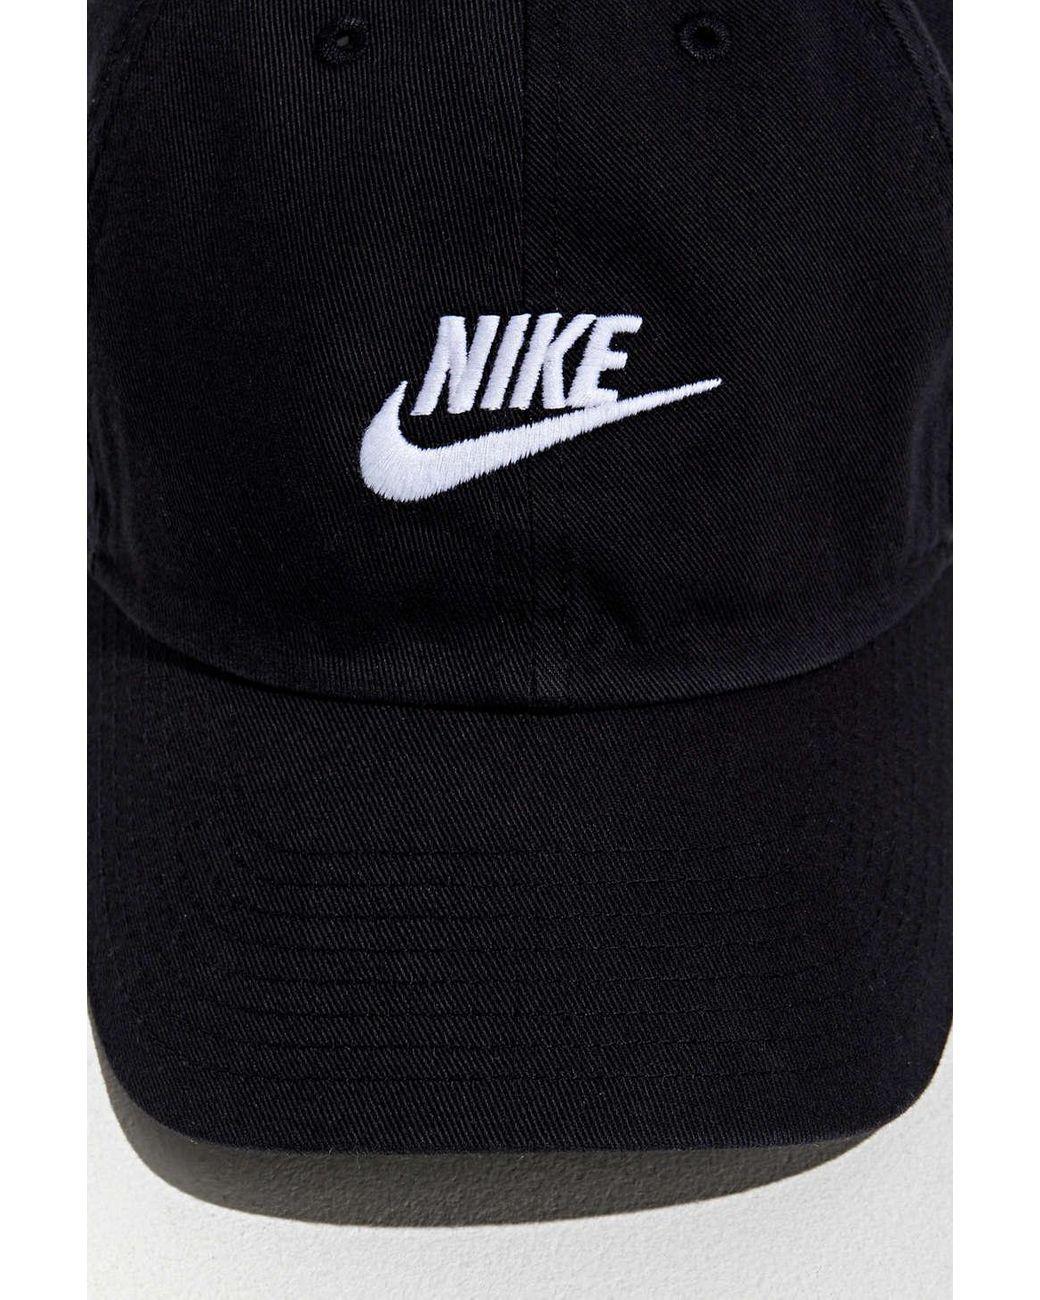 Nike Sportswear H86 Futura Washed Baseball Hat